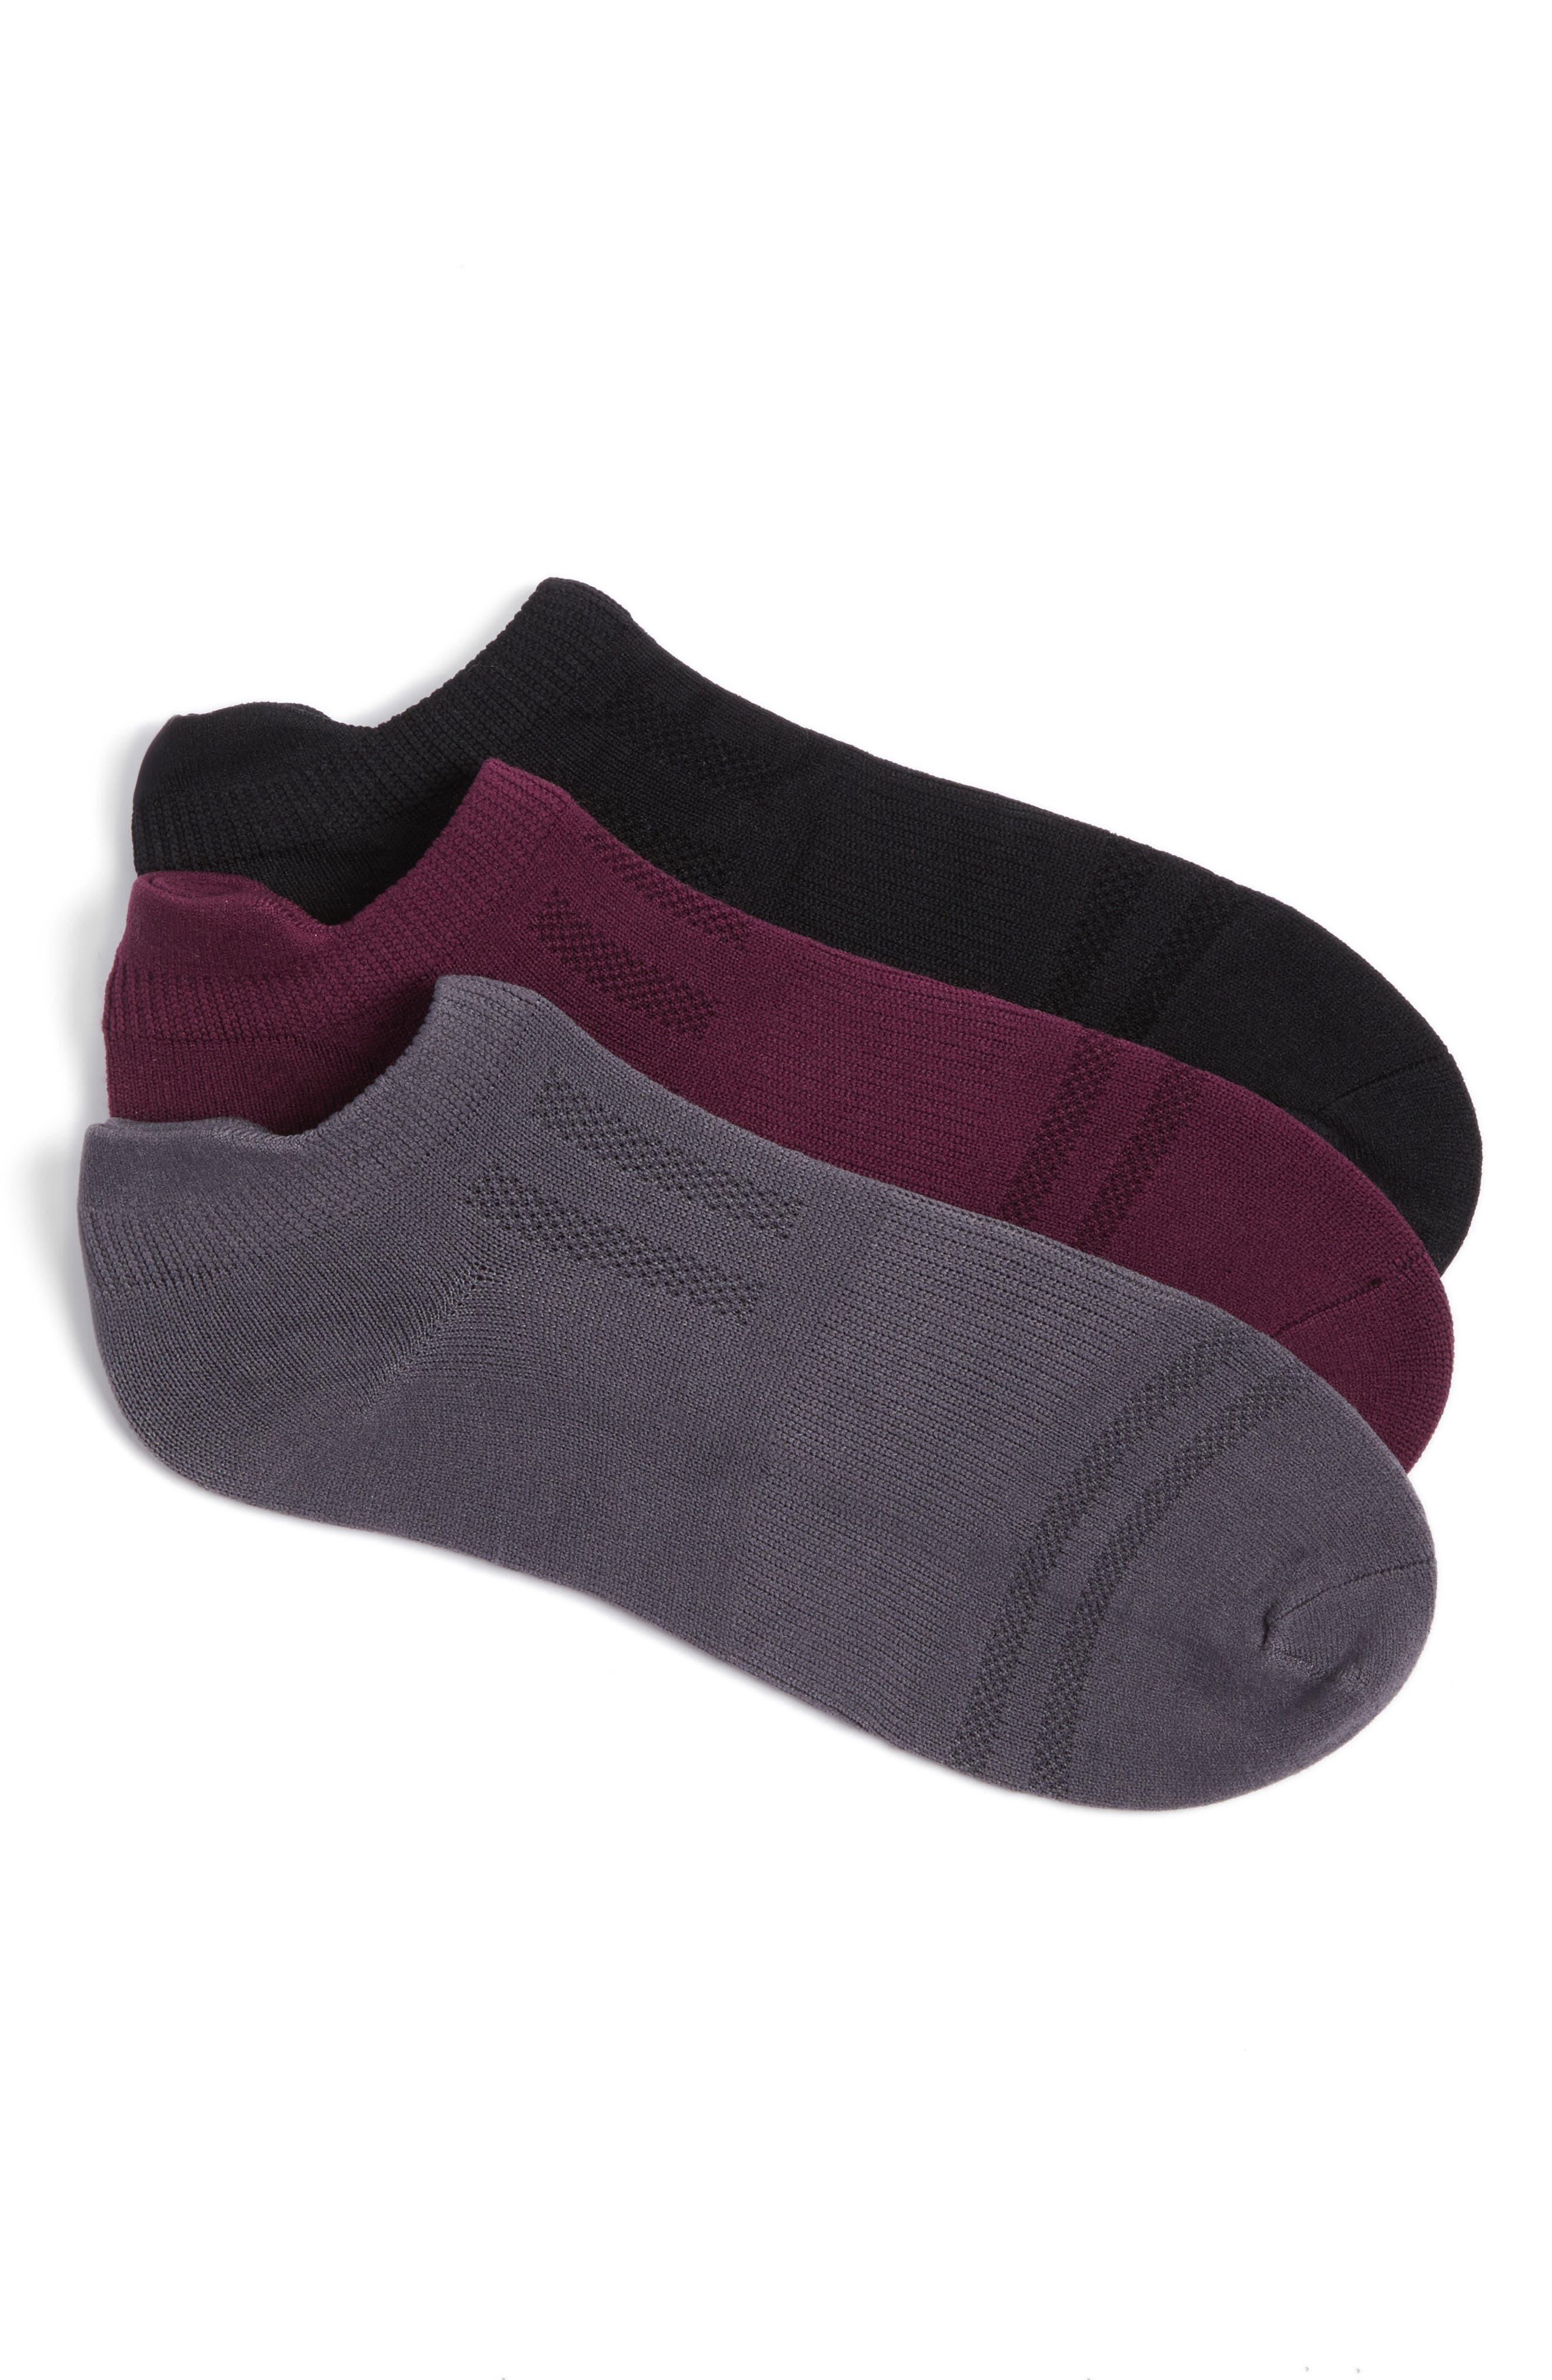 Alternate Image 1 Selected - Sof Sole 3-Pack Low Cut Socks